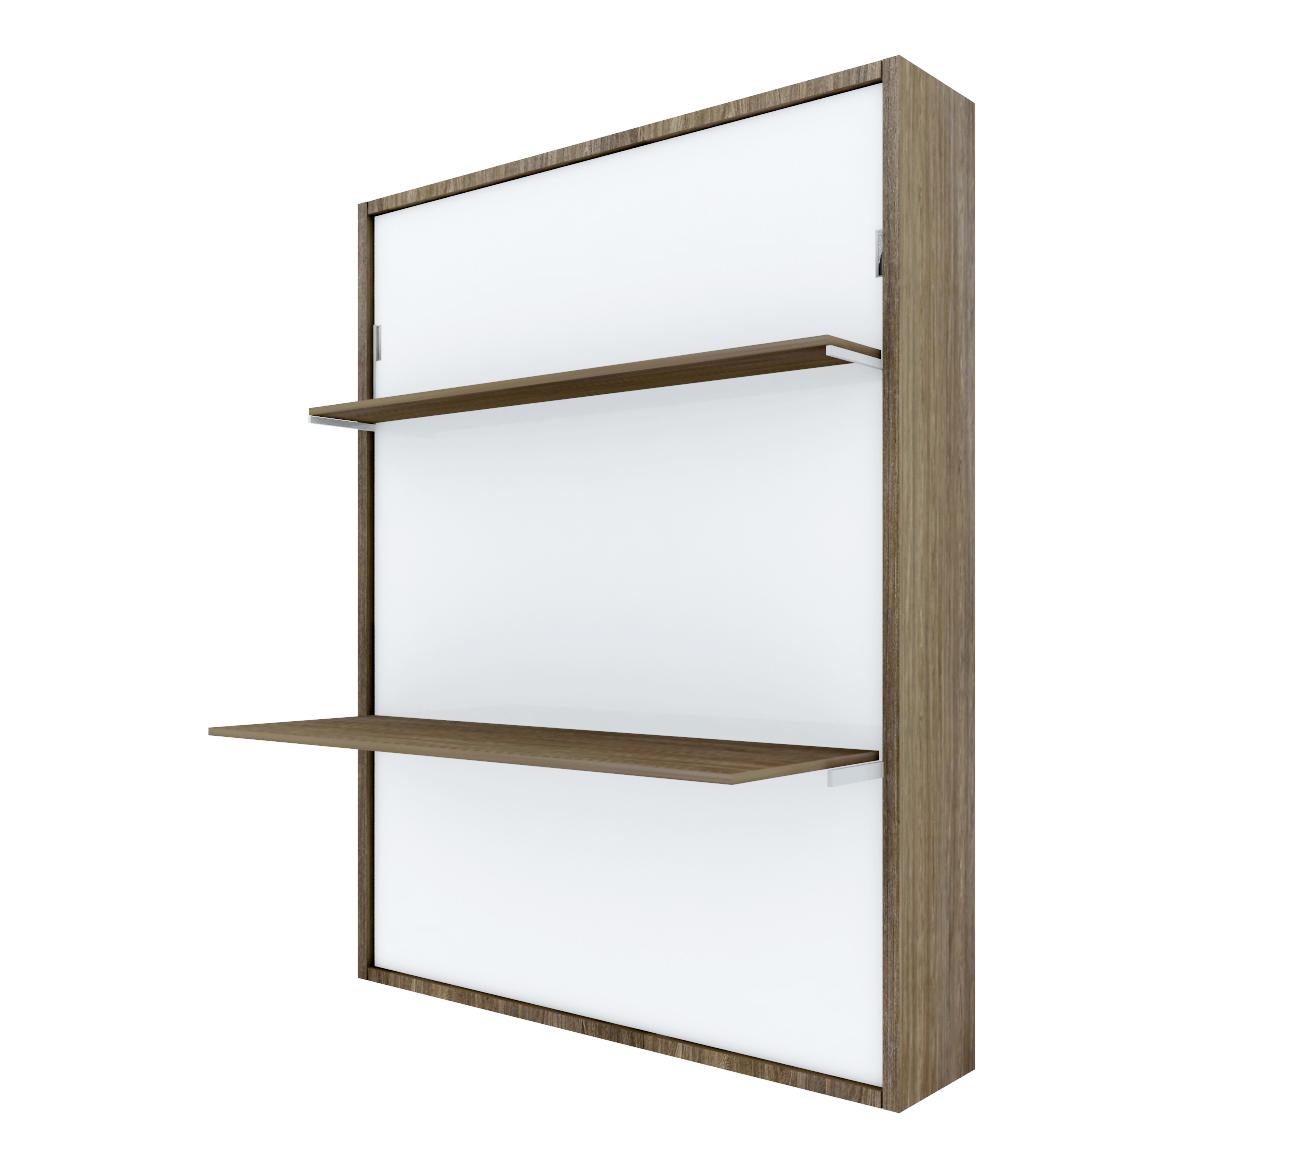 PAT RABATABIL CU BIROU&RAFT – SmartBed V Desk&Shelf